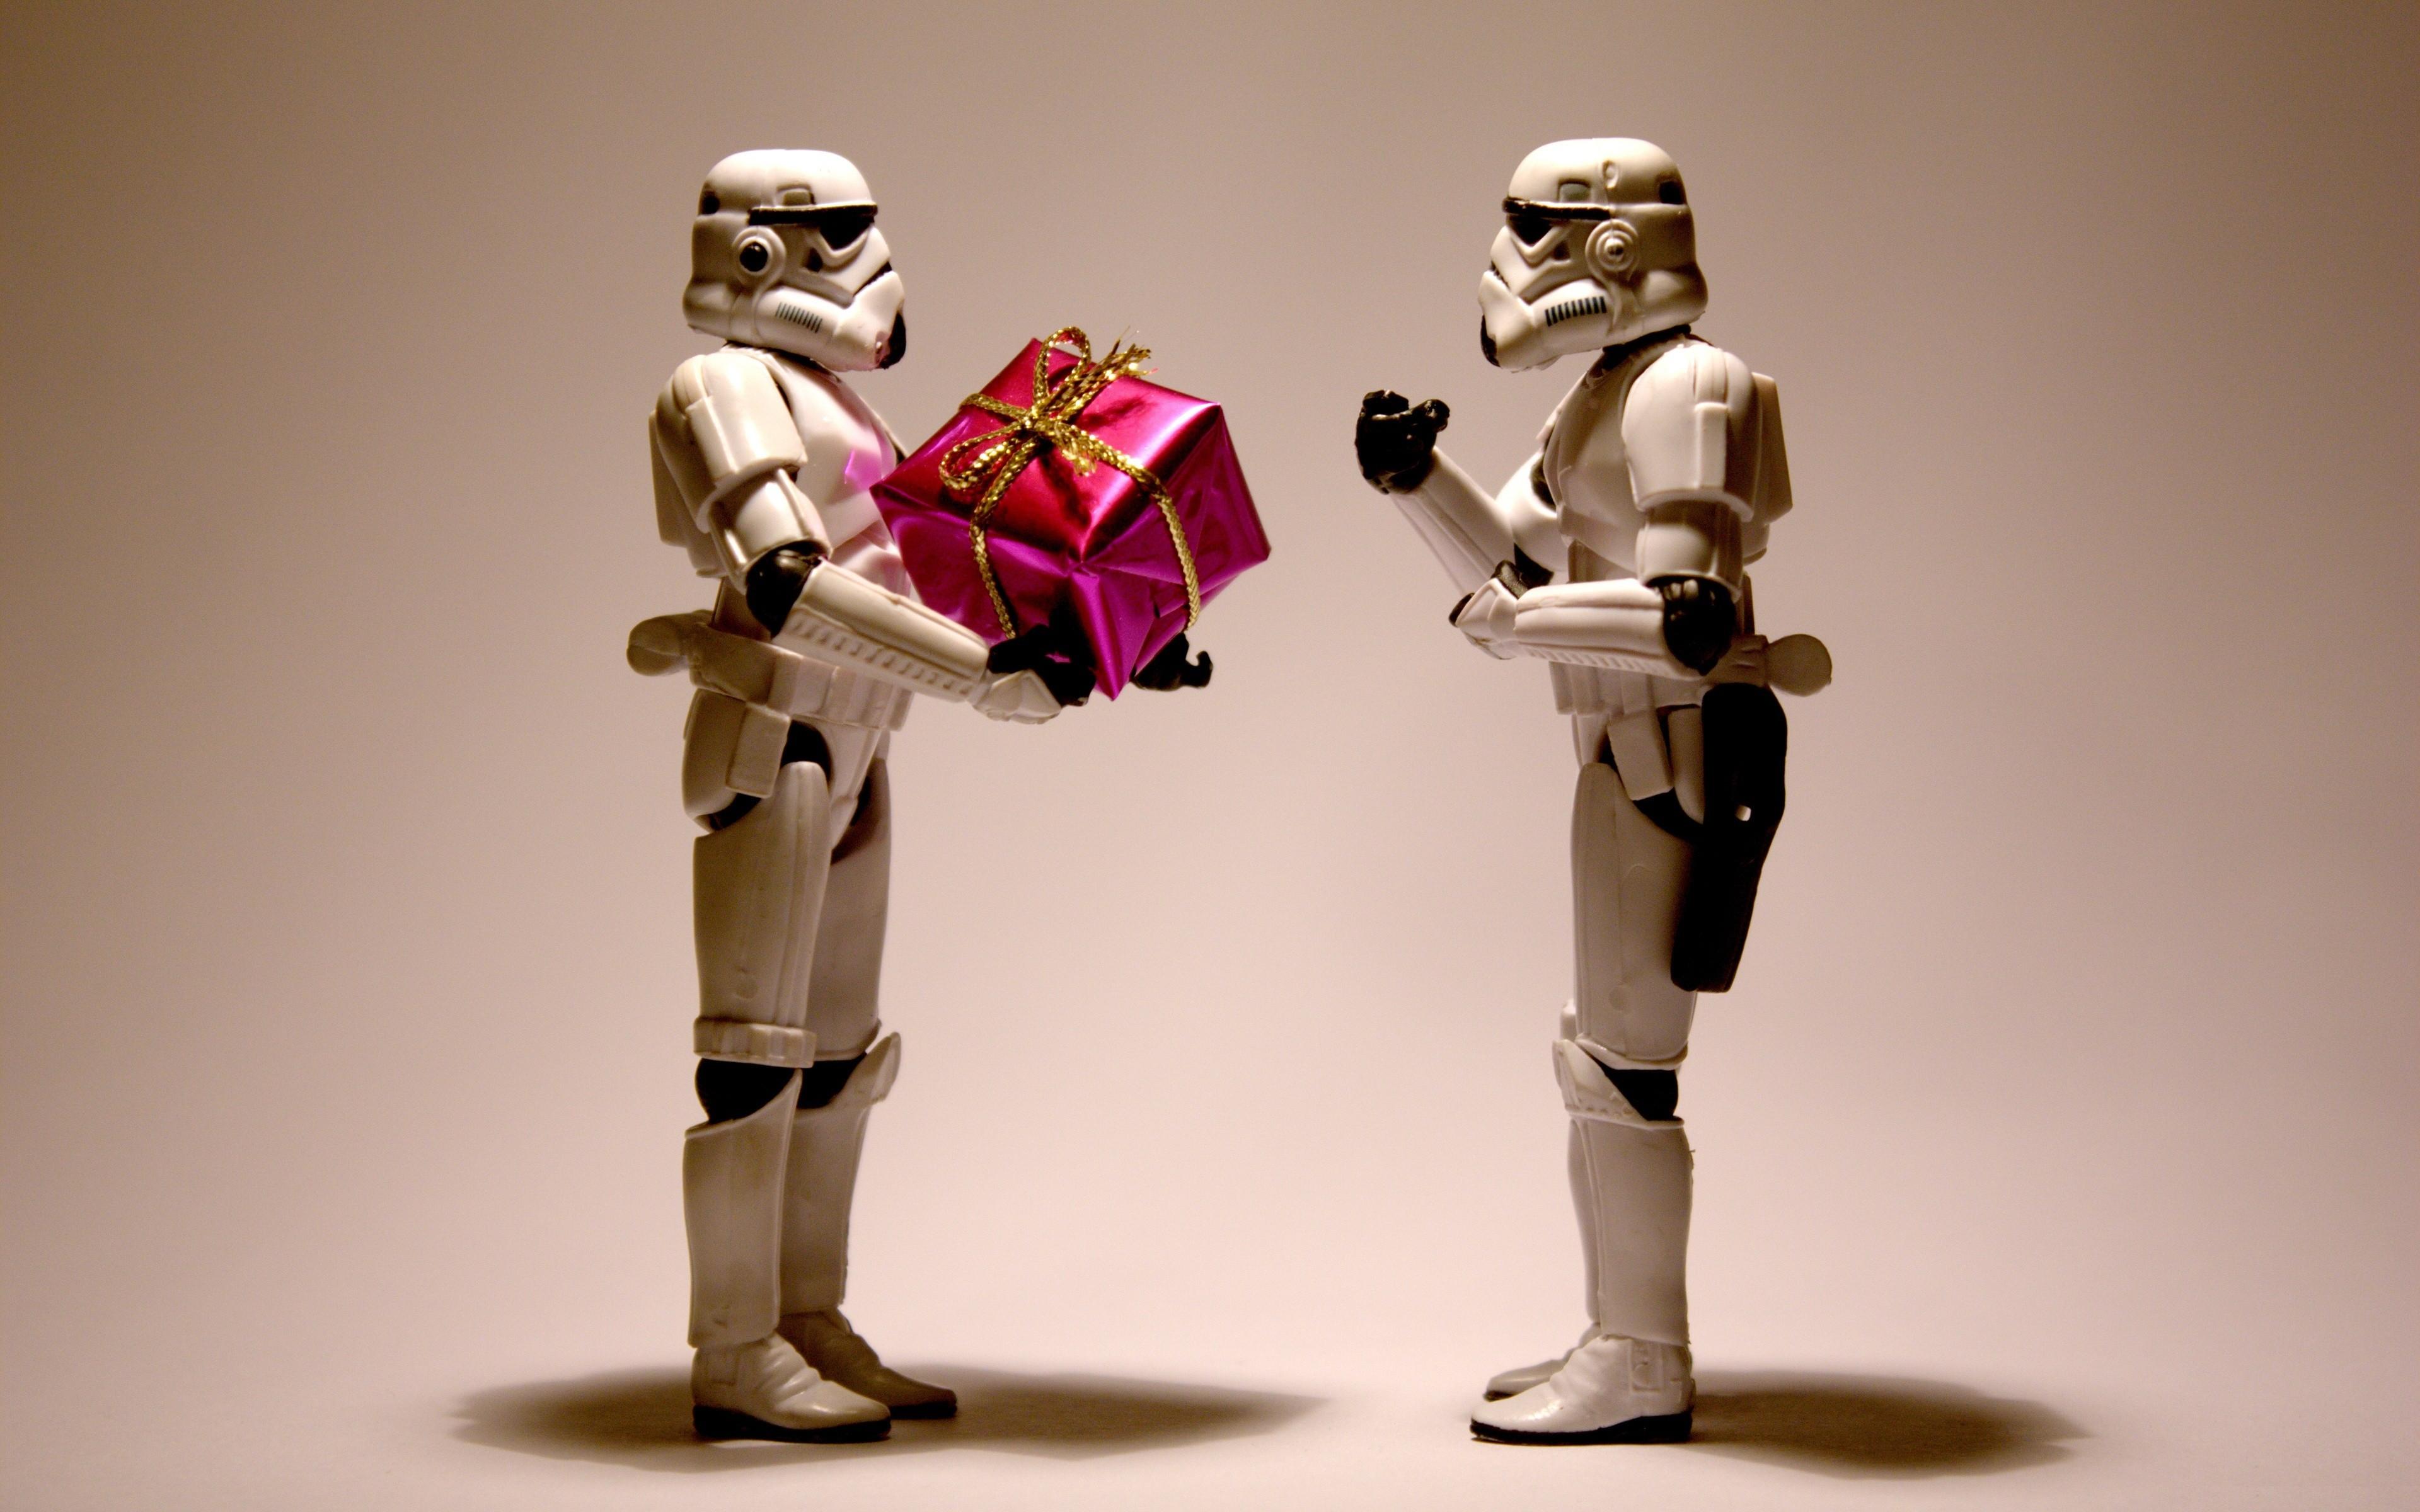 Funny Christmas Gift Part - 23: ... Funny Homemade Christmas Gift Ideas Guaranteed To Make; Presentes  Engraçados De Natal Playbuzz ...